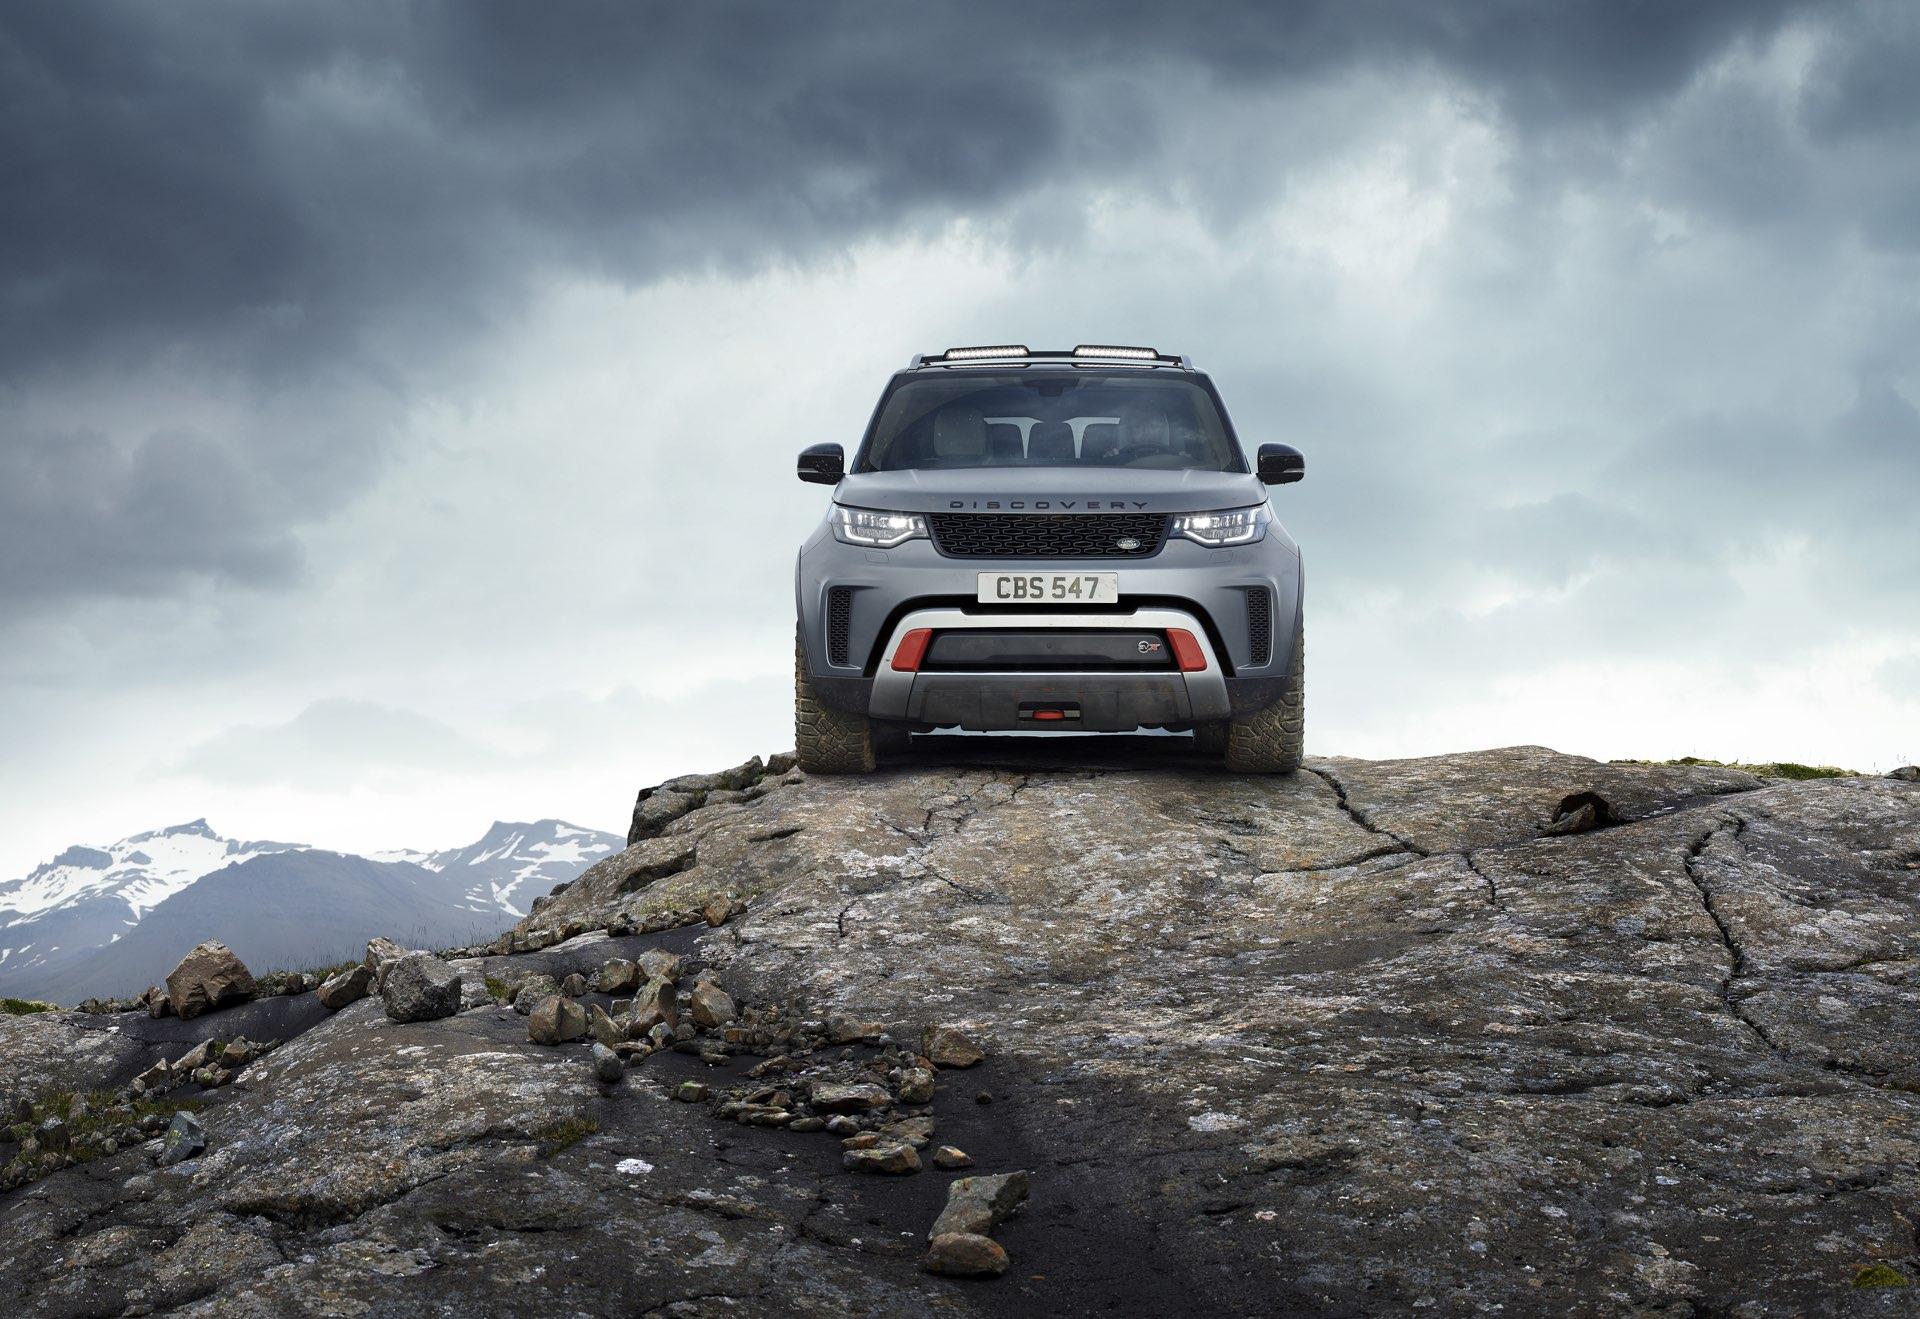 https://storage.googleapis.com/gtspirit/uploads/2017/09/Land-Rover-Discovery-SVX109.jpg